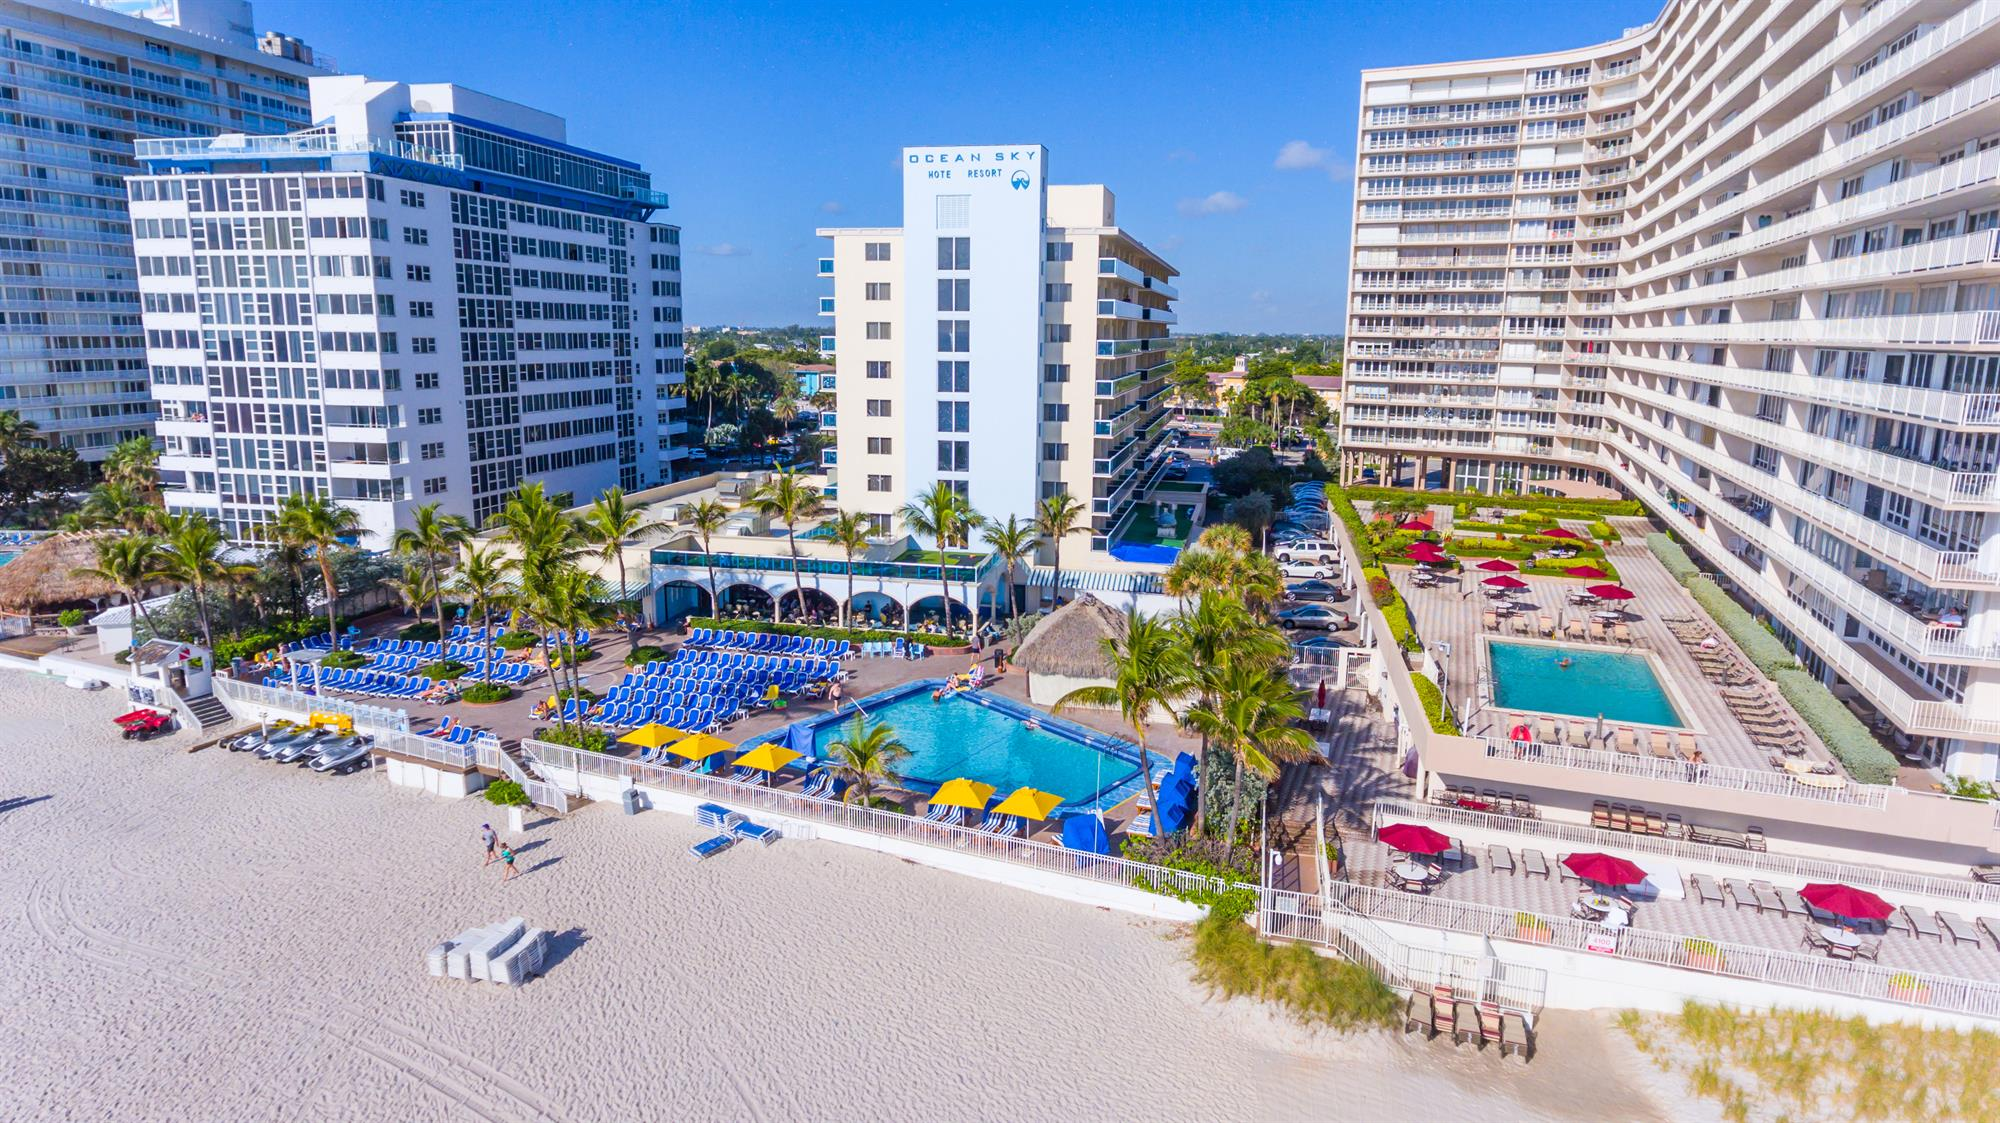 Ocean Sky Hotel And Resort Promo Code